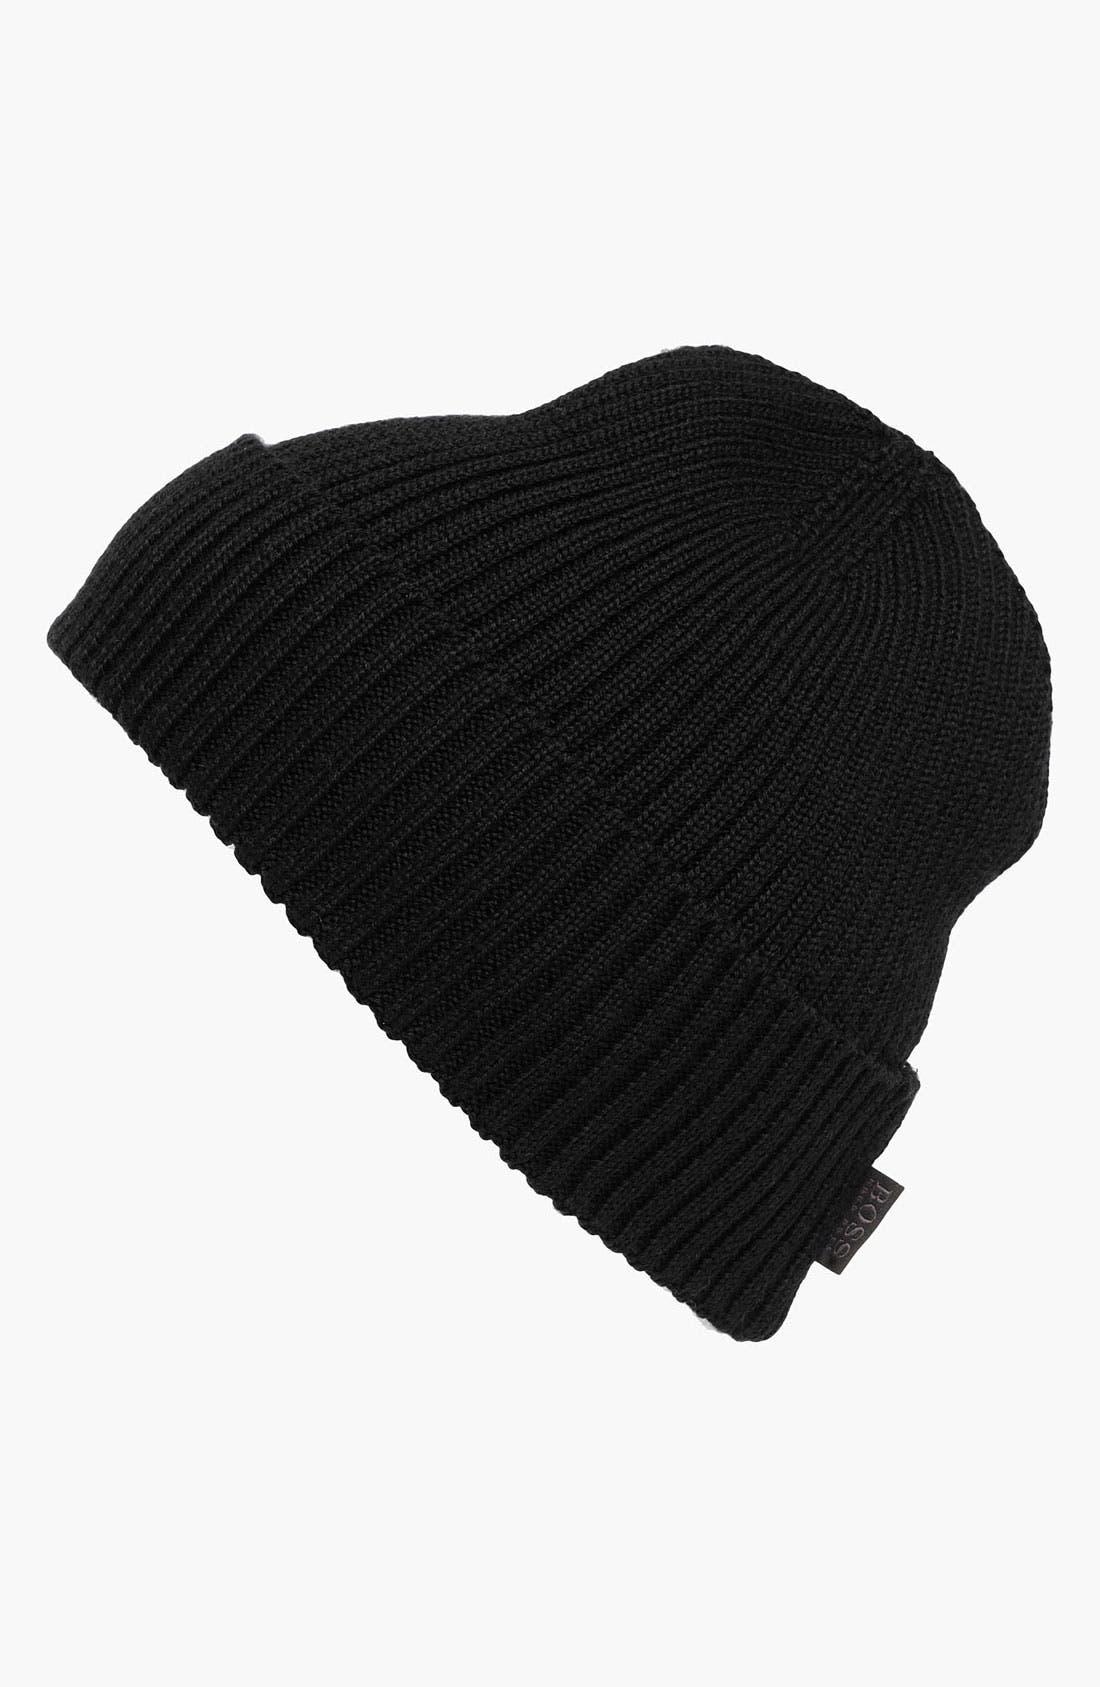 Main Image - BOSS Black 'Nattea' Wool Knit Cap